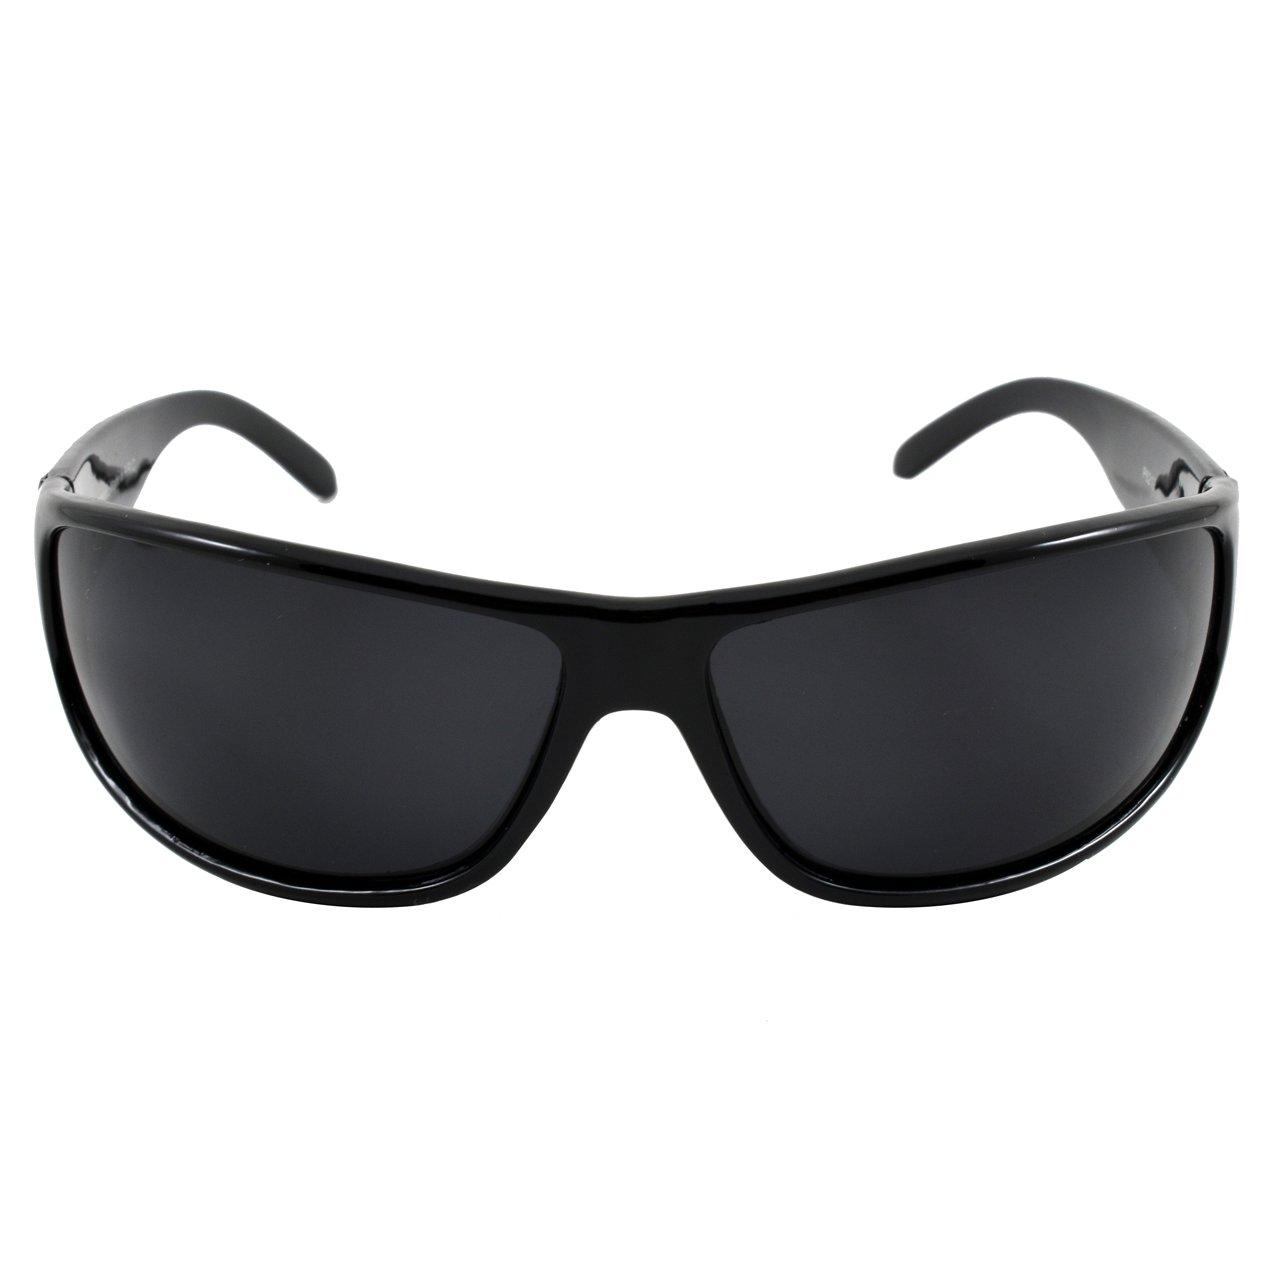 قیمت عینک آفتابی الدرادو مدل Big Wide Black